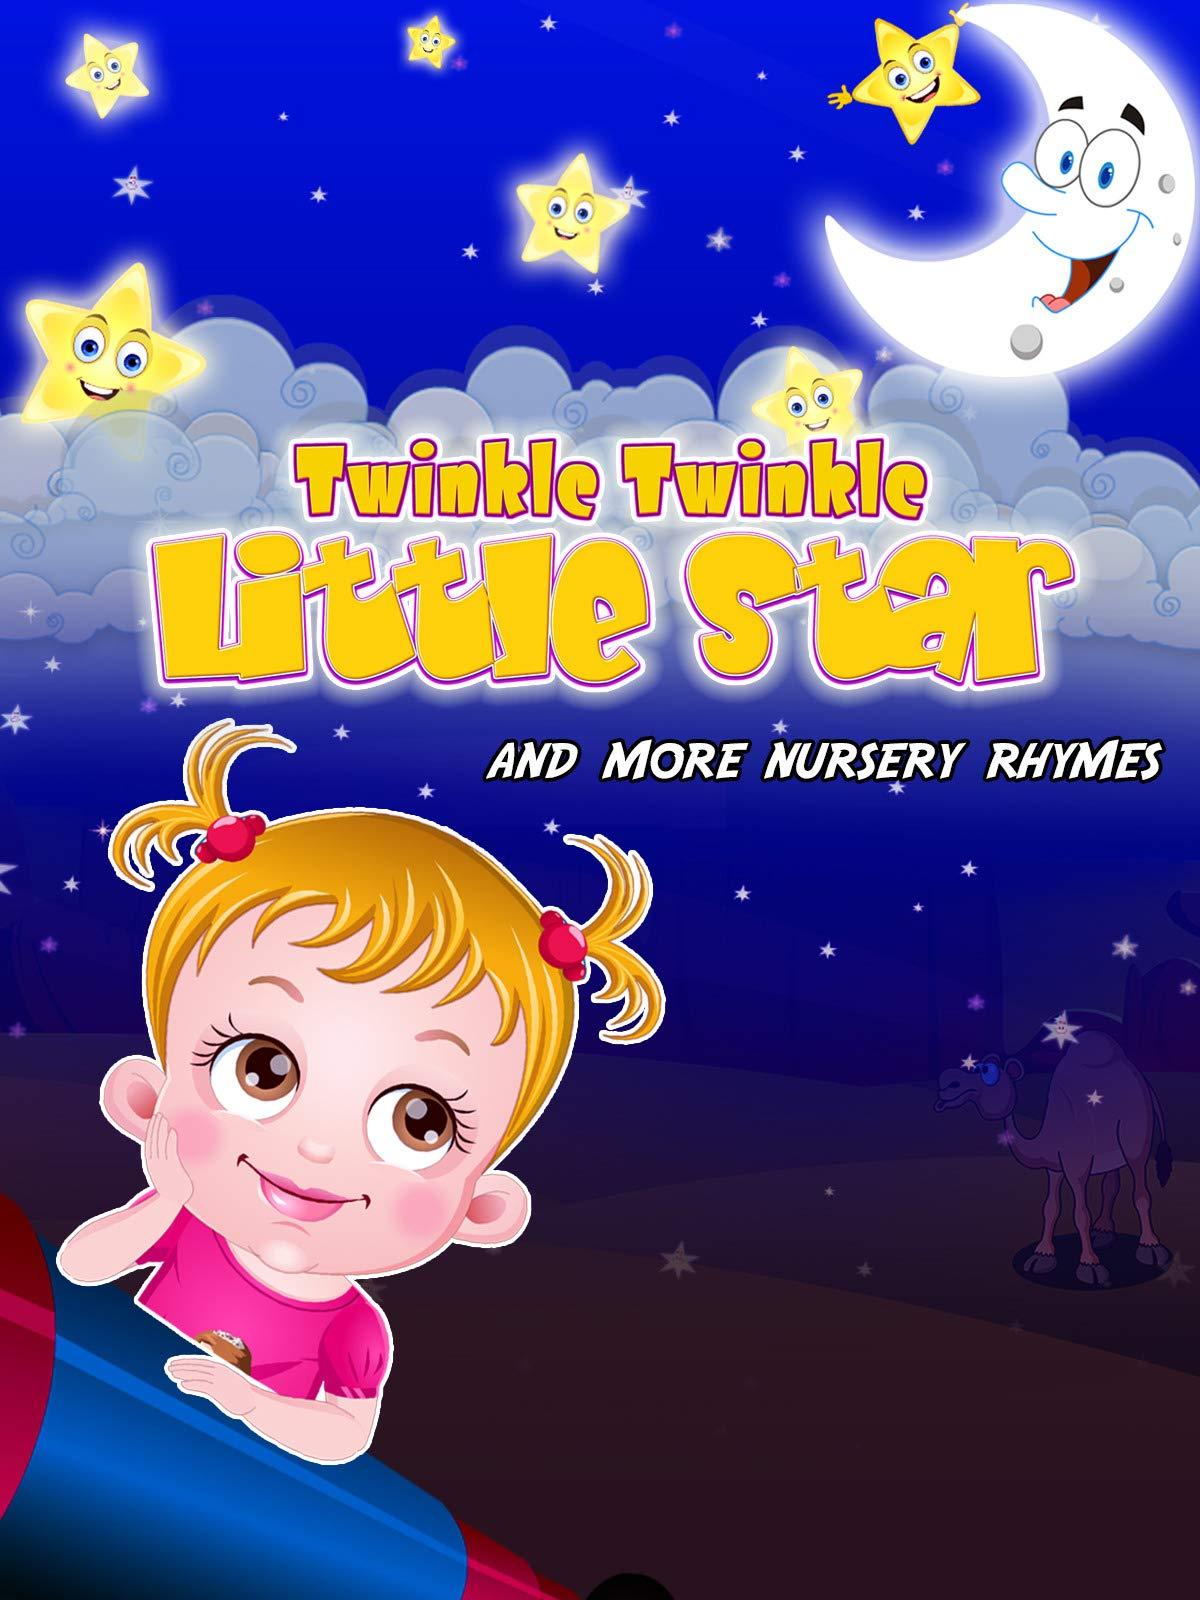 Twinkle Twinkle Little Star And More Nursery Rhymes on Amazon Prime Video UK